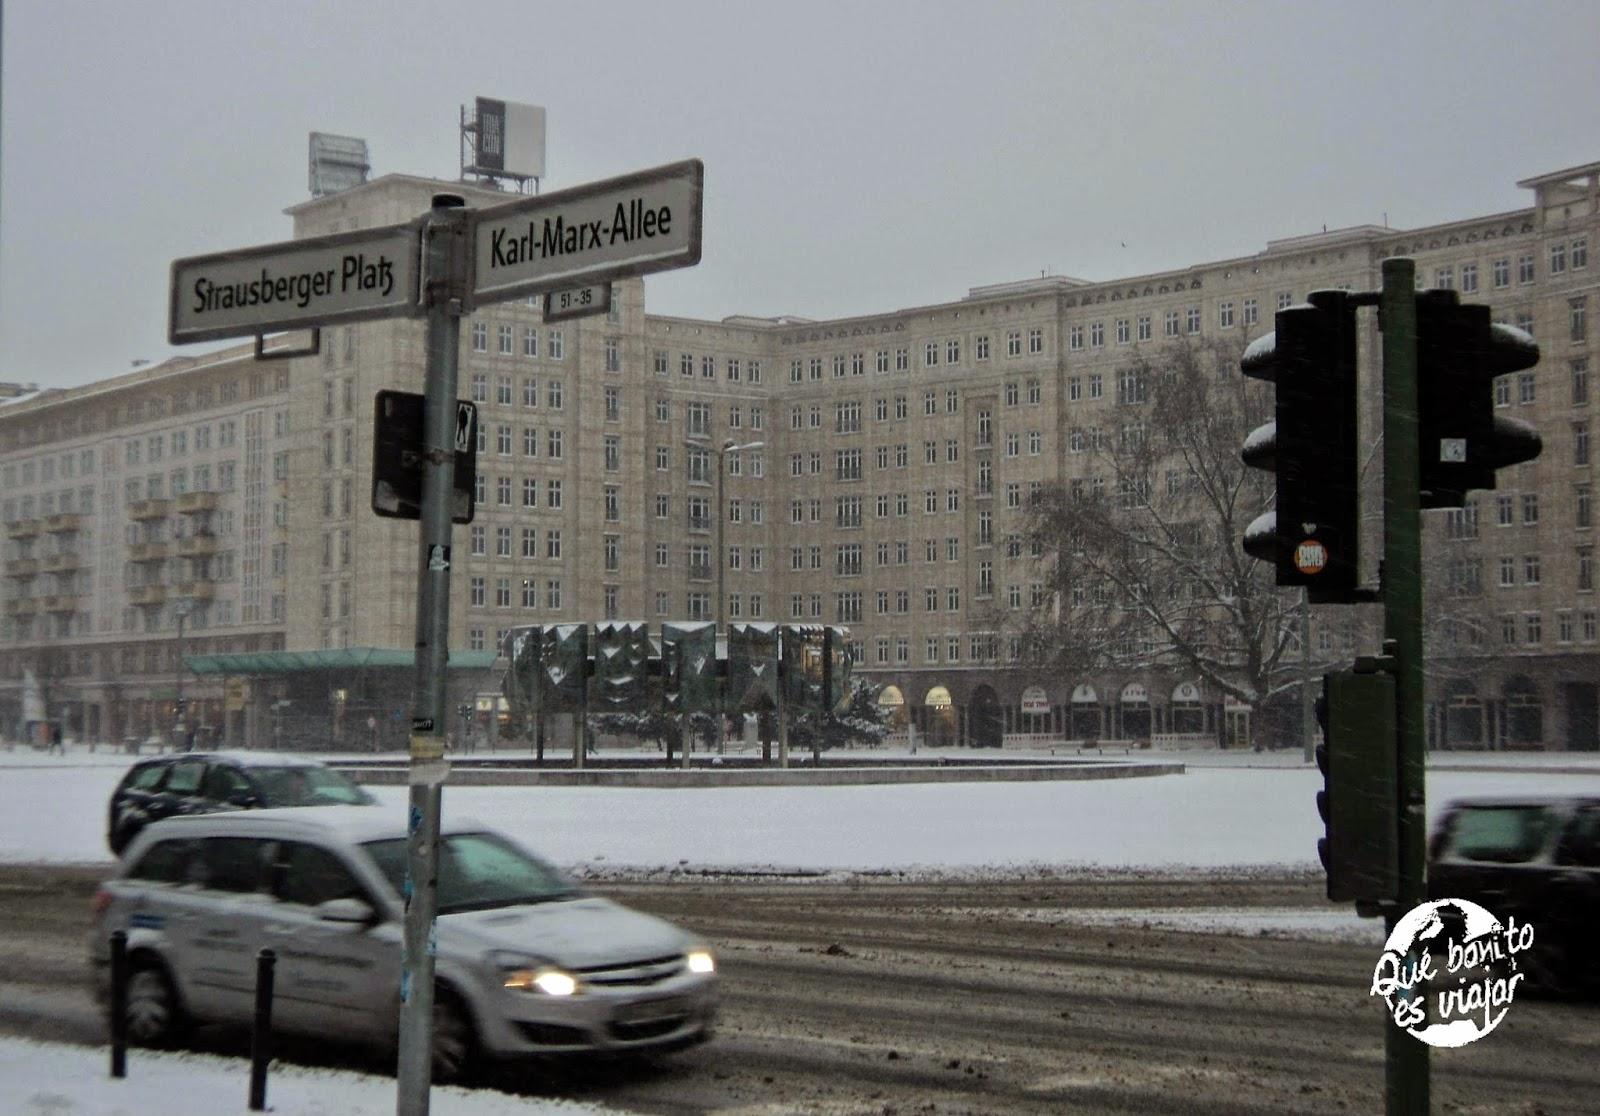 Friedrichshain Berlín alternativo